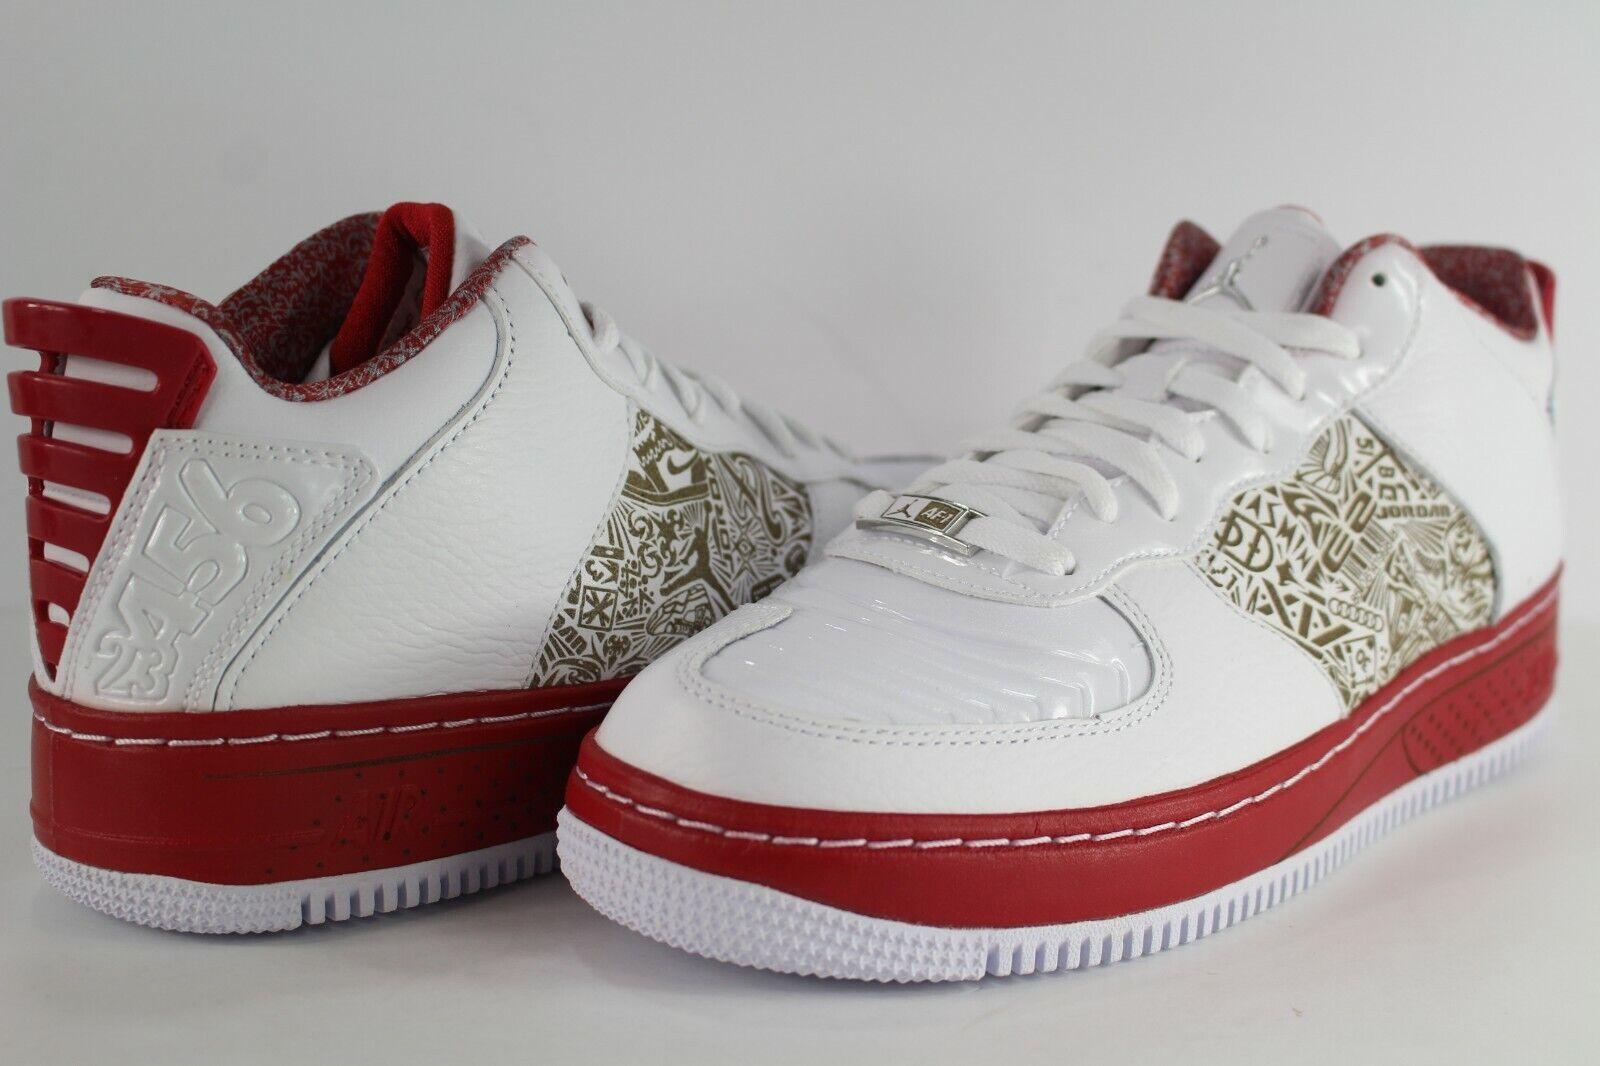 Nike AFJ Air Force Jordan 20 XX Low bianca Metallic  argento Varsity rosso 332122 -101  economico e di alta qualità